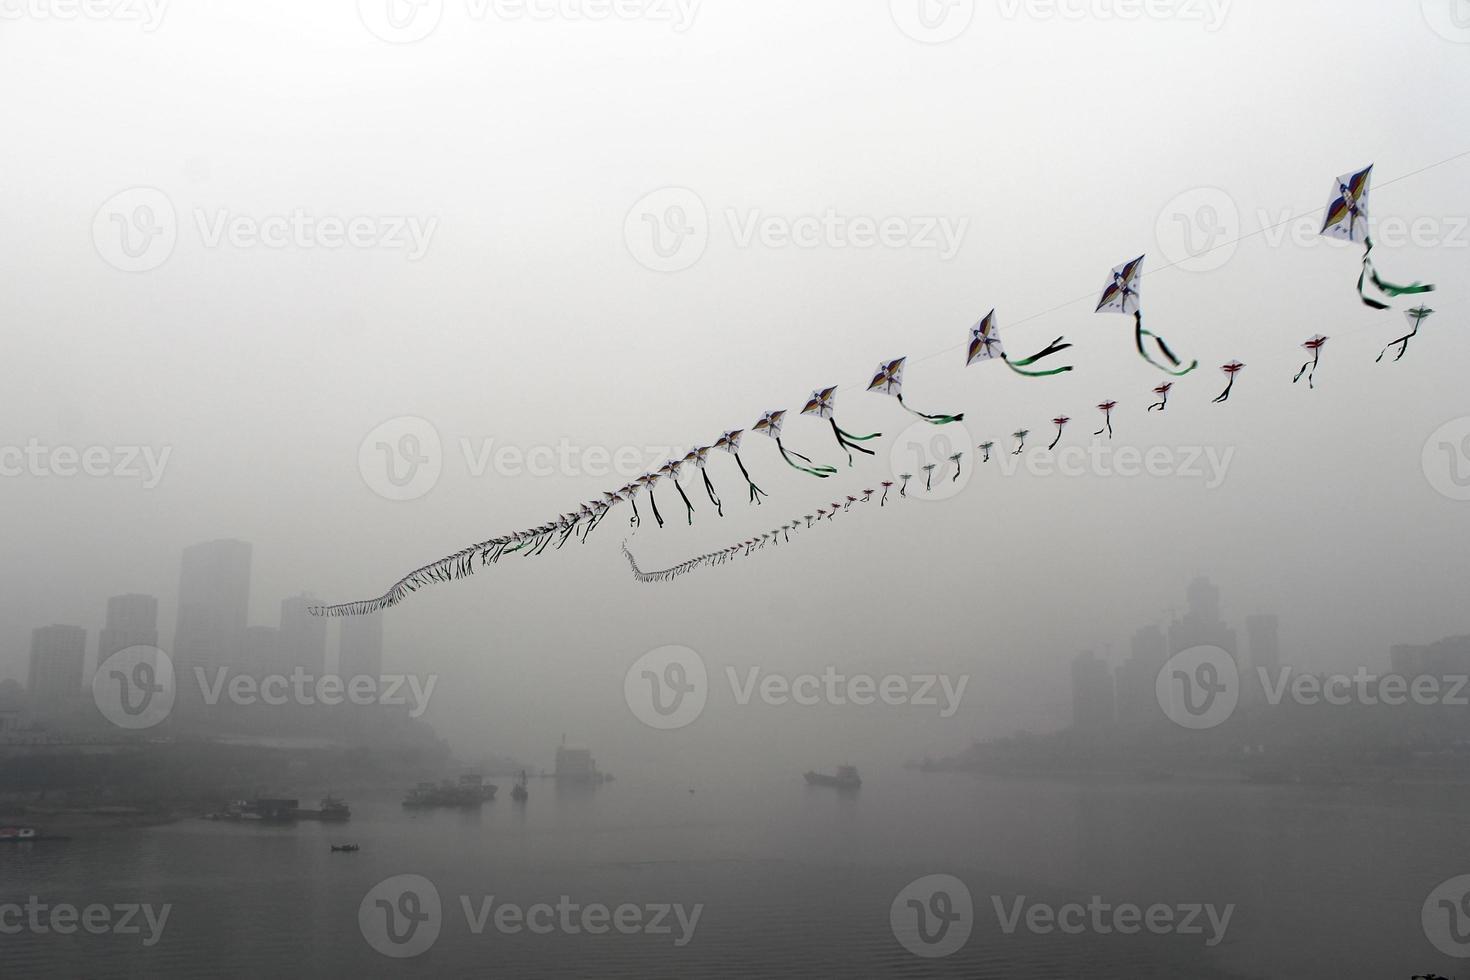 vliegers in de mist foto